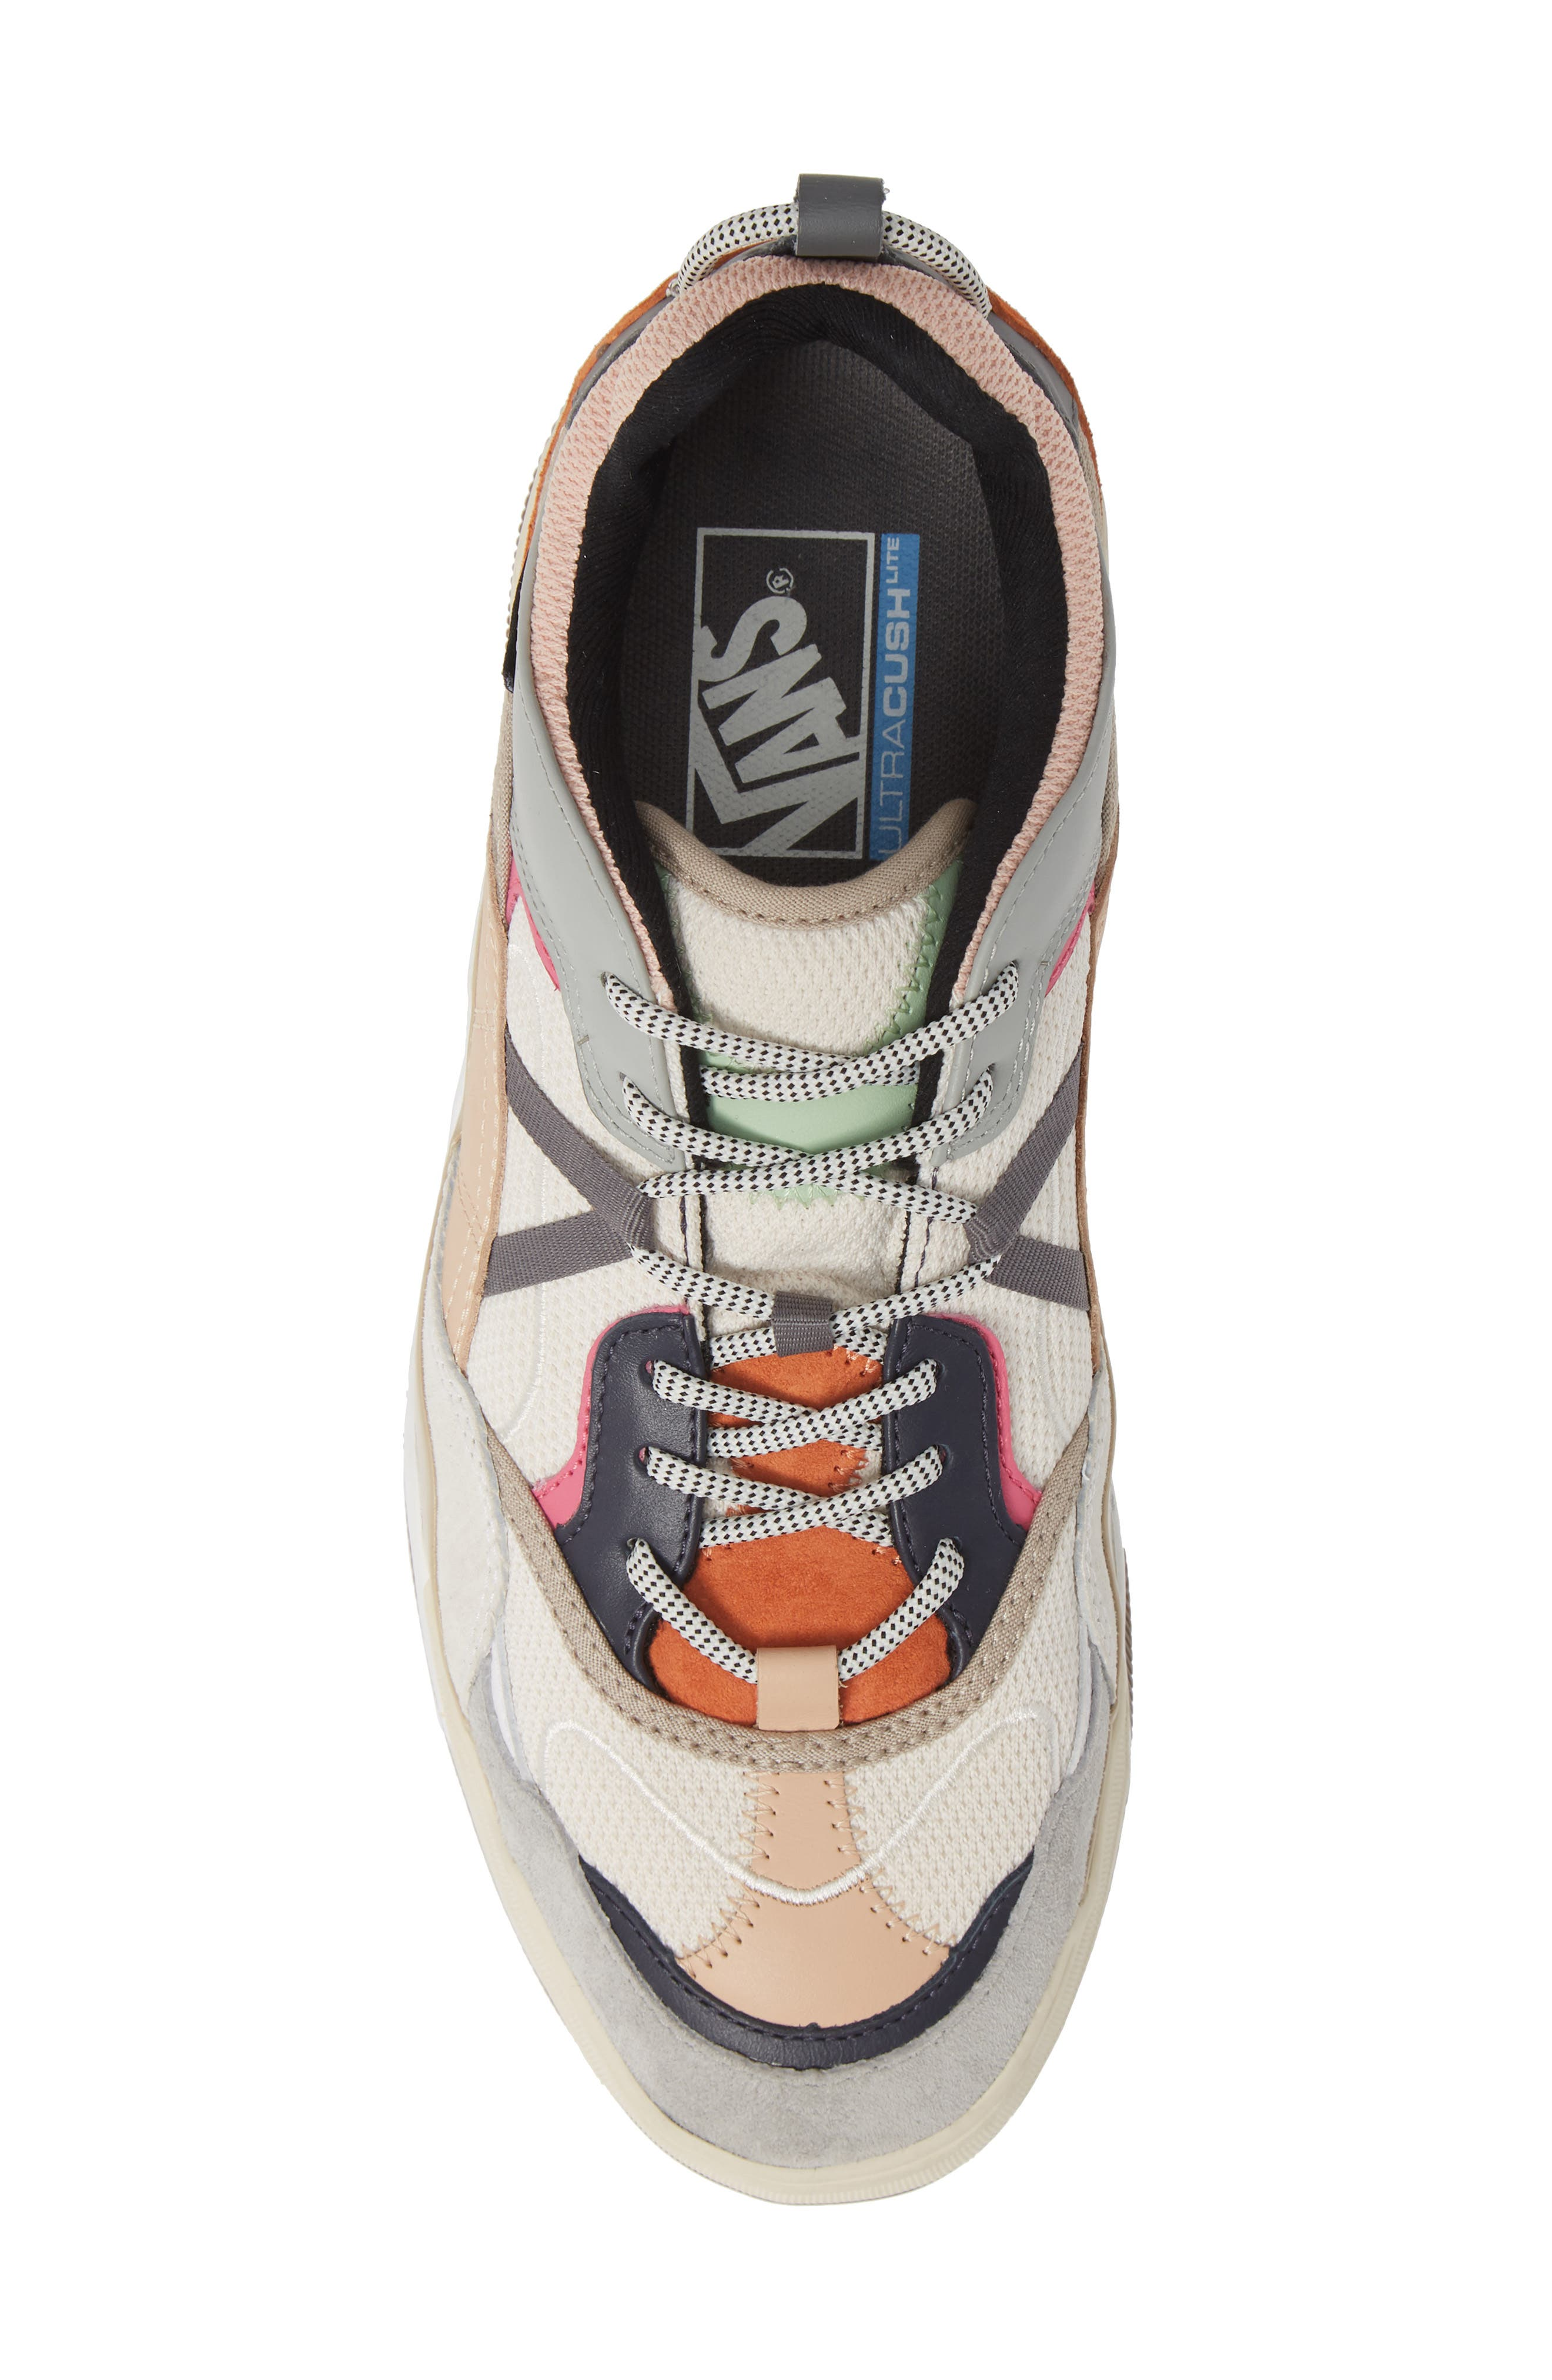 VANS,                             Varix WC Sneaker,                             Alternate thumbnail 5, color,                             TURTLEDOVE/ TRUE WHITE LEATHER